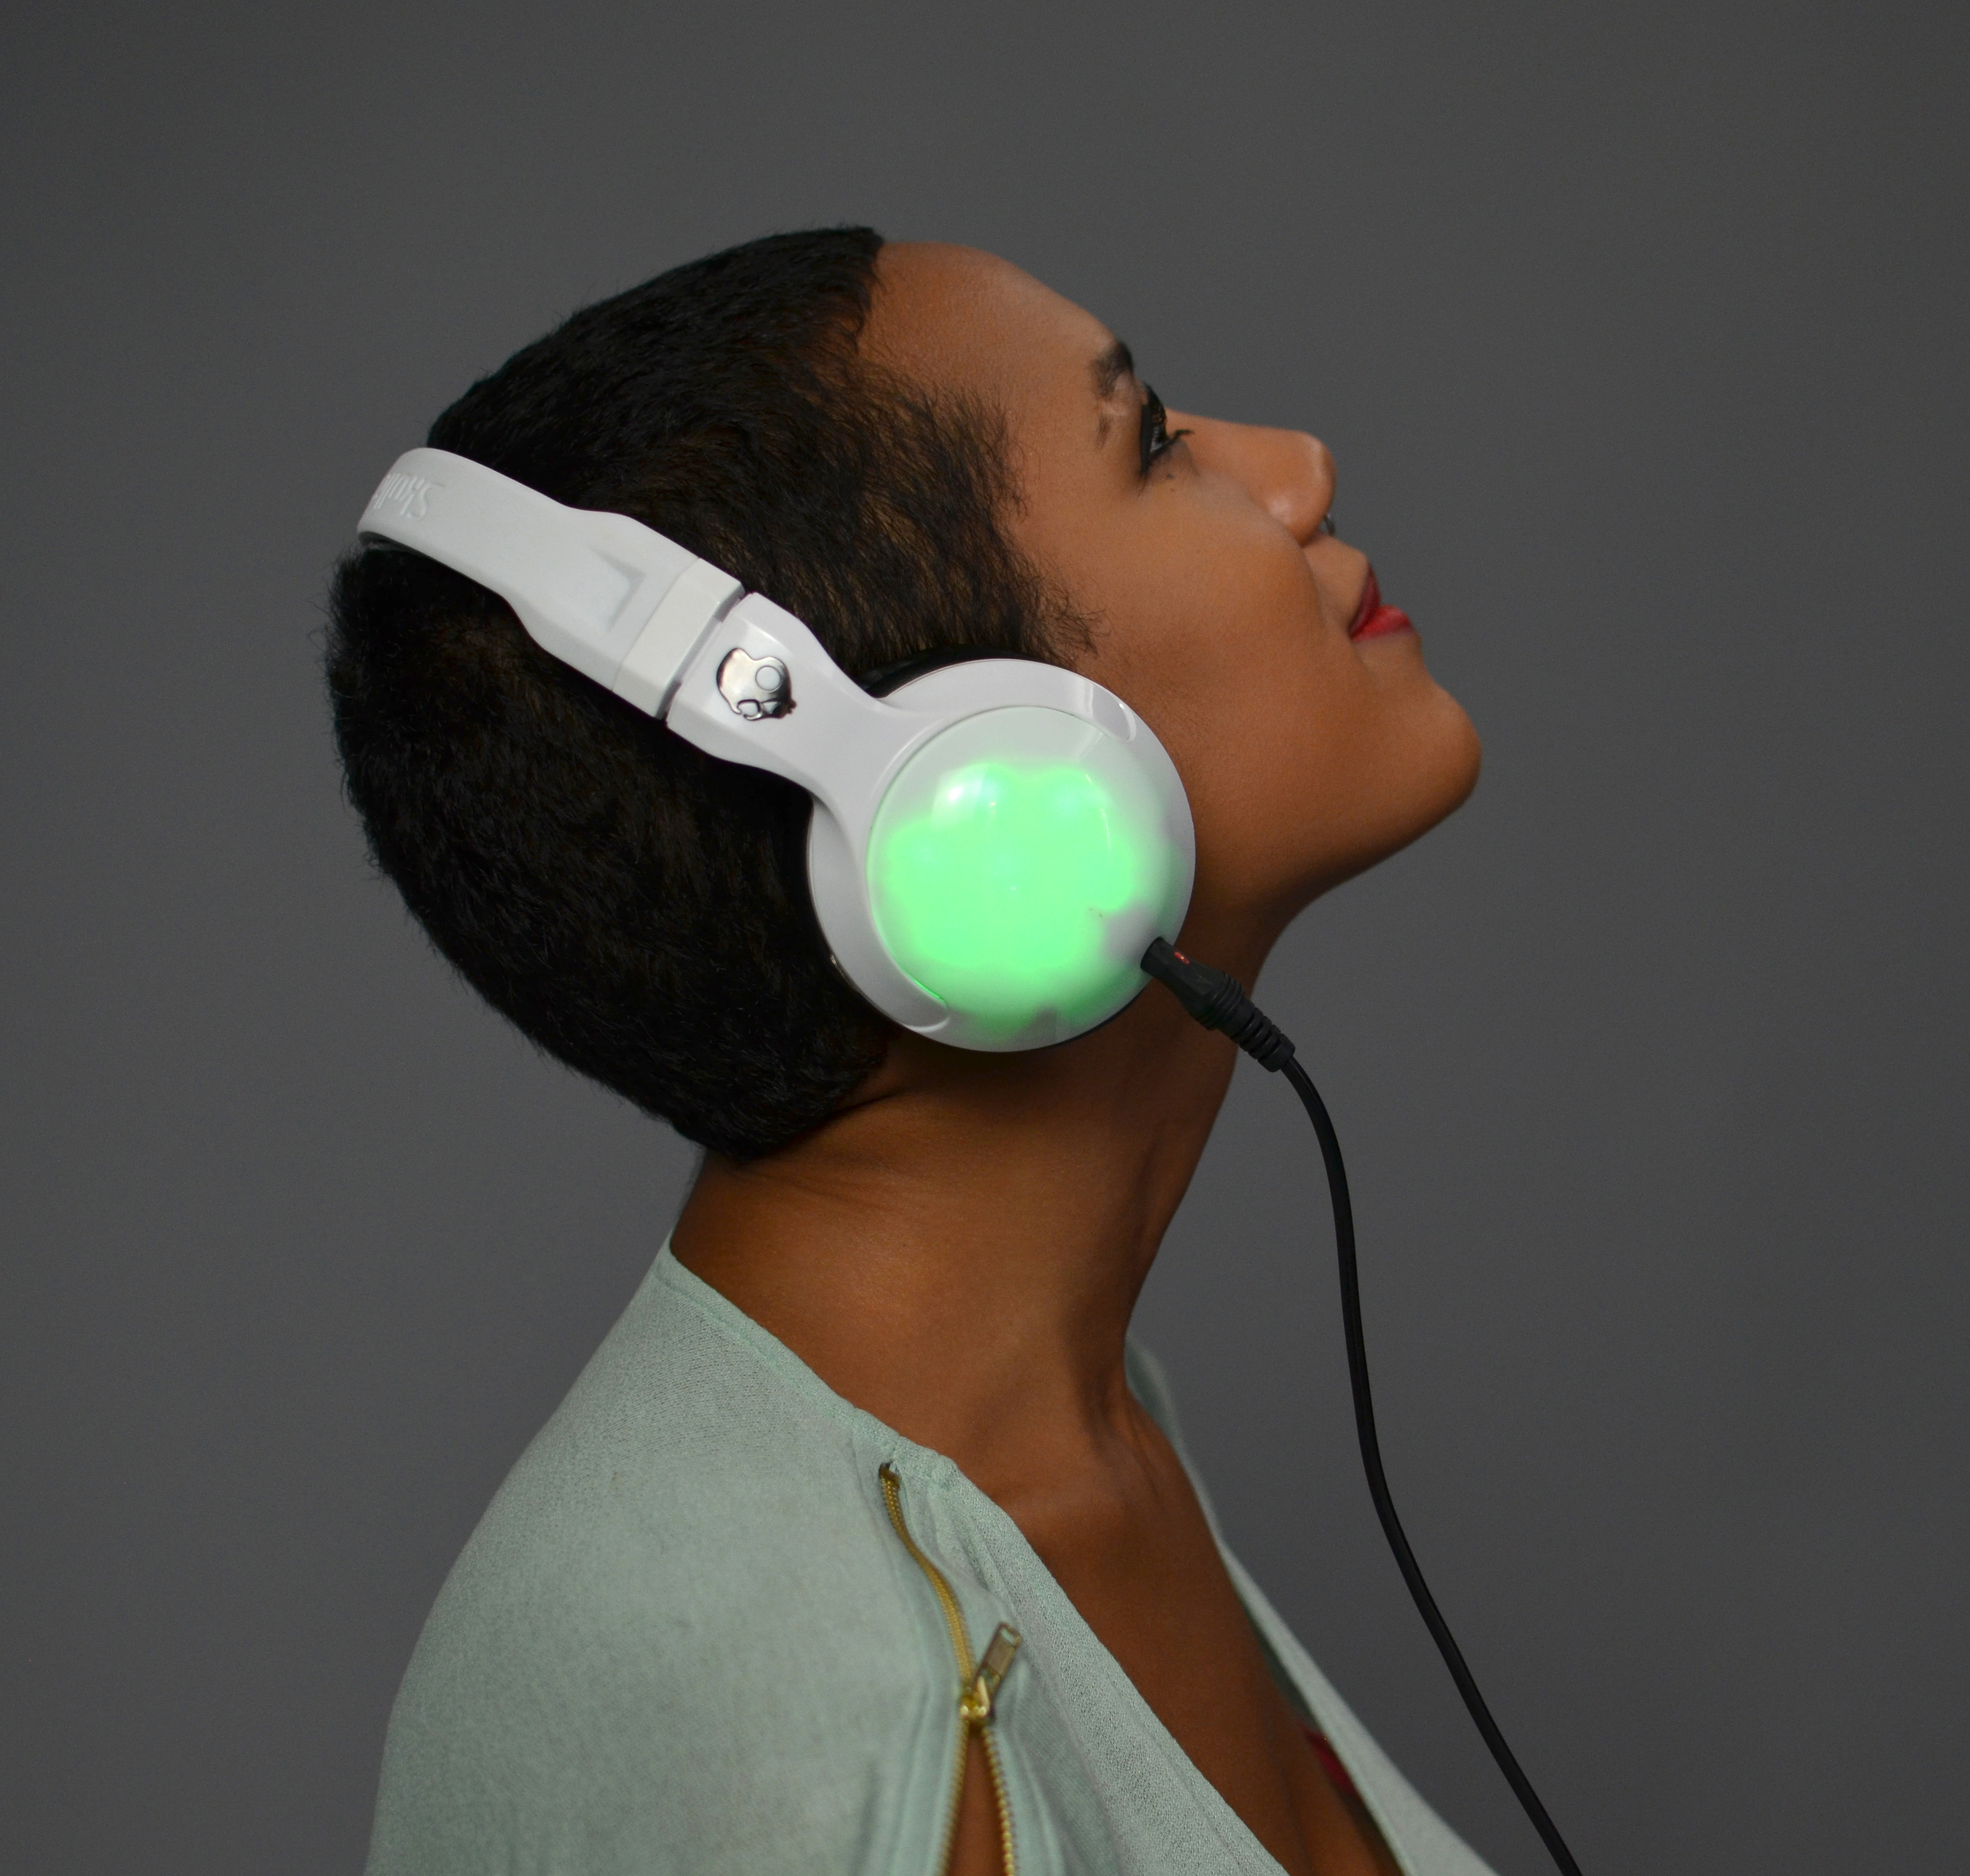 flora_RisaRose_Skullcandy_LED_Headphones.jpg